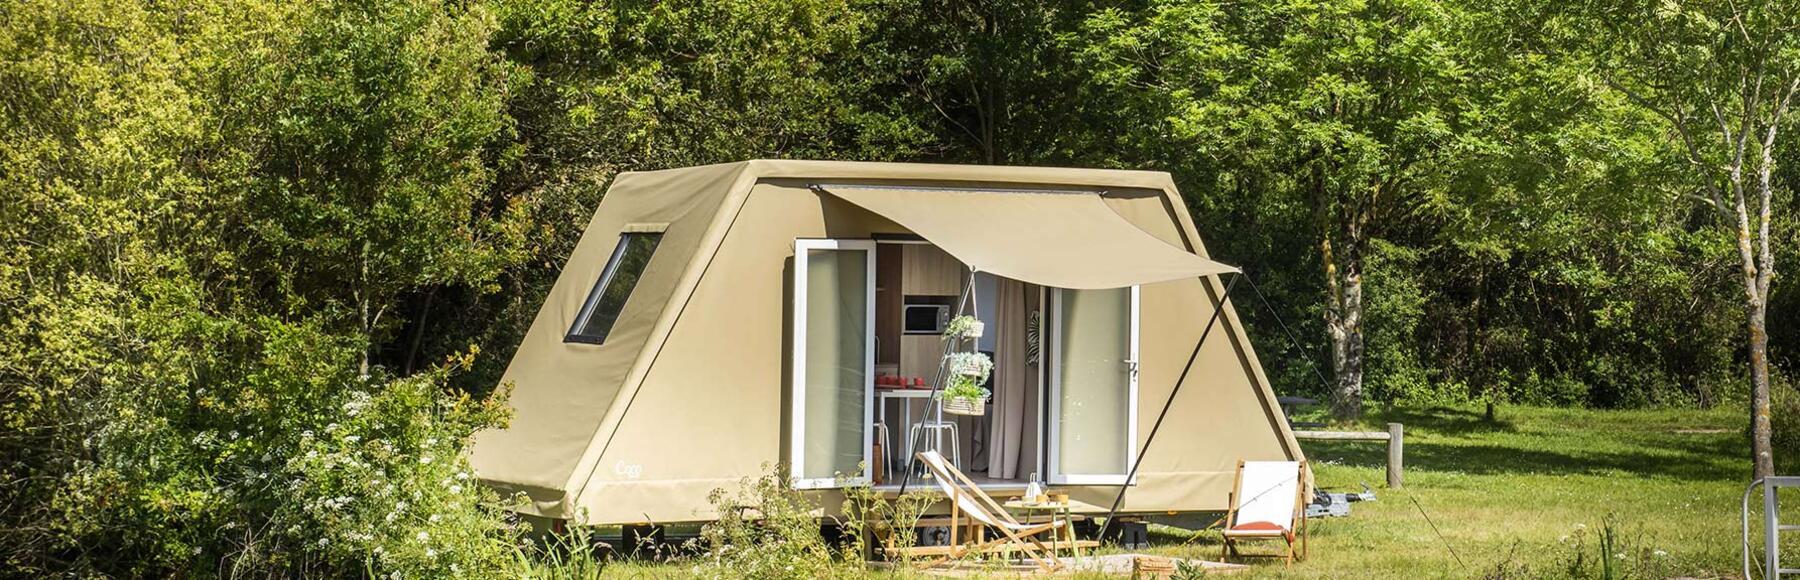 elbadoc-campingvillage it tende-attrezzate 006